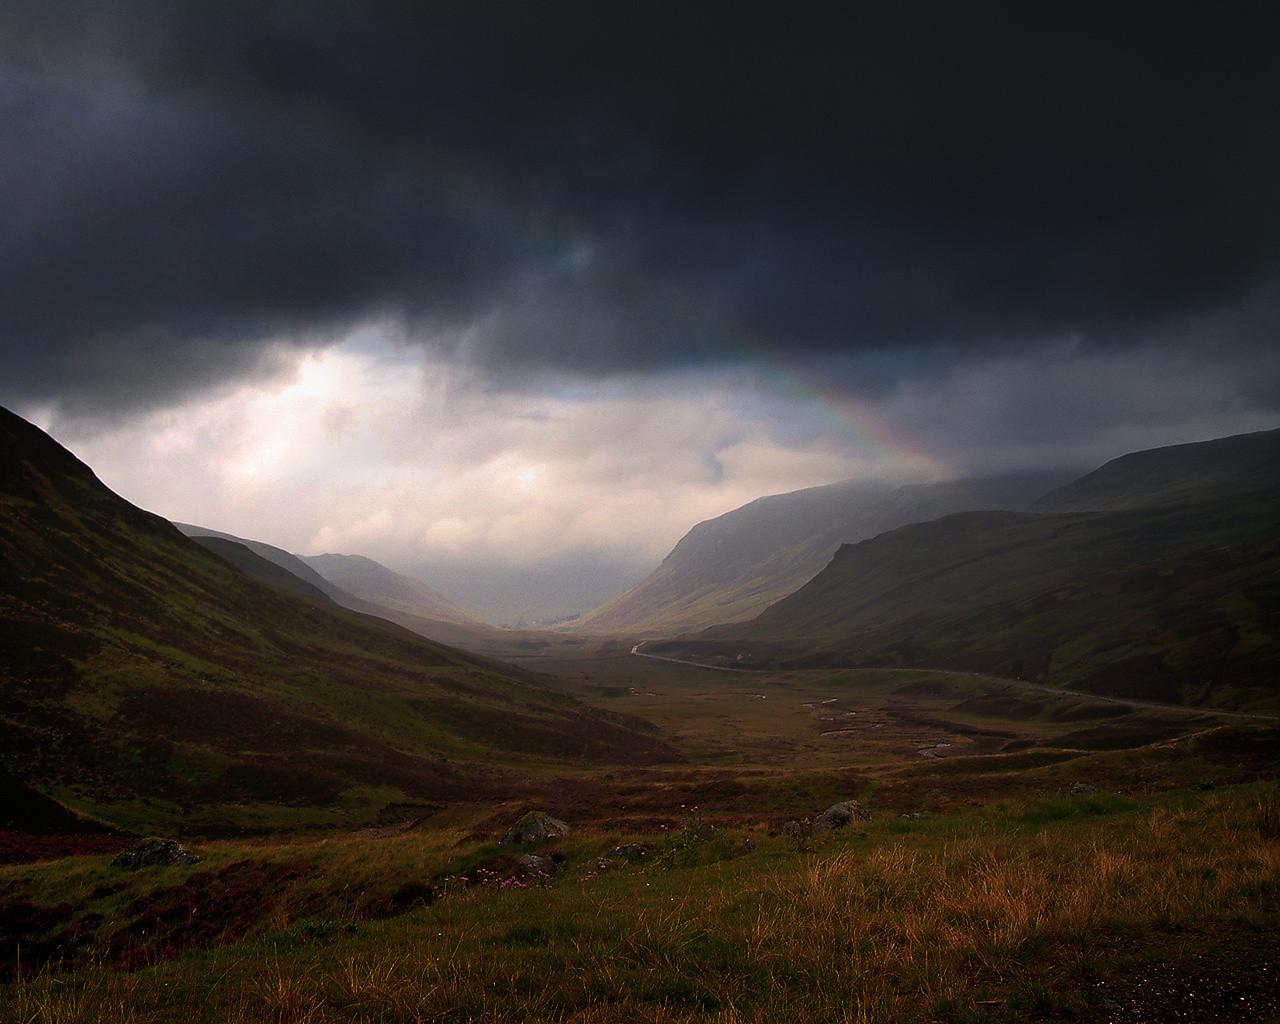 Nubes negras en el paisaje